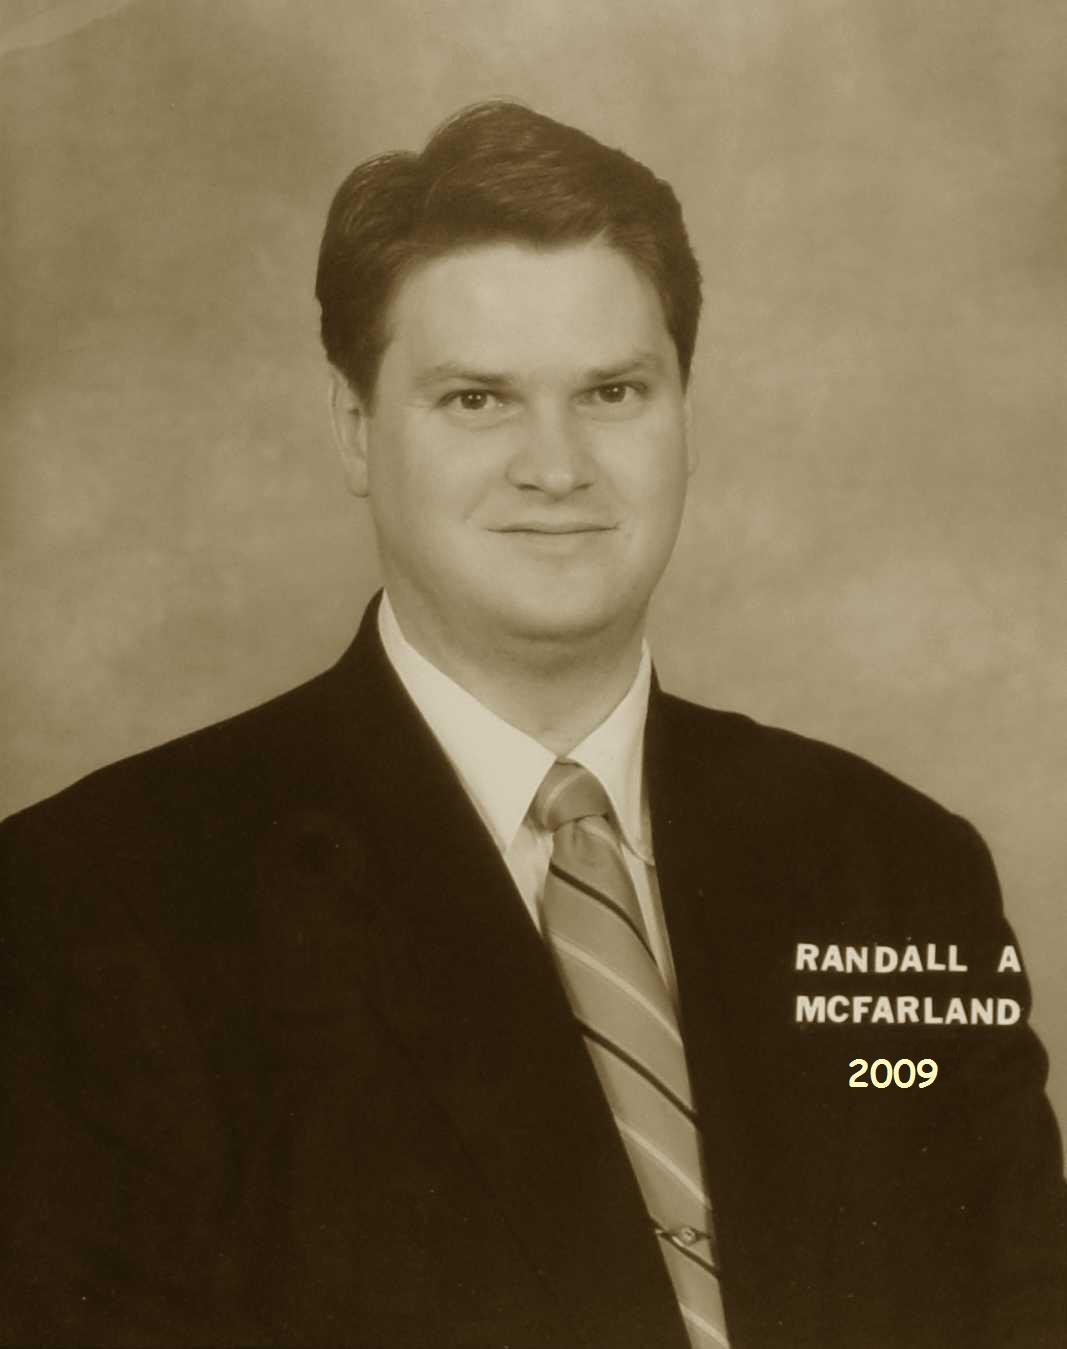 Randall A. McFarland, 2009